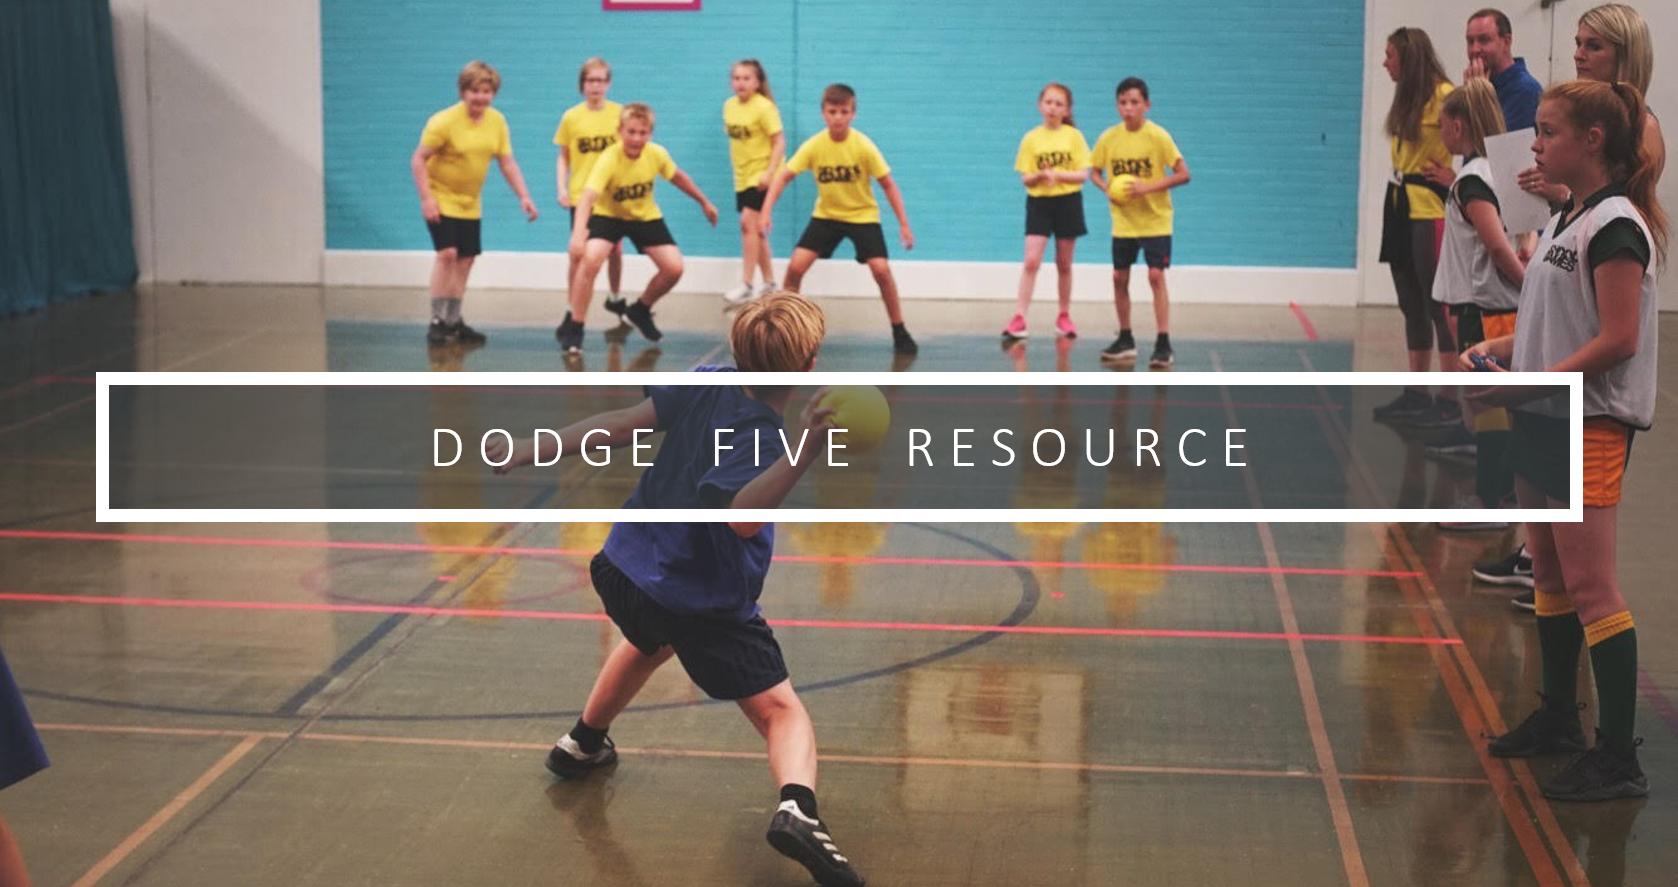 Dodge Five